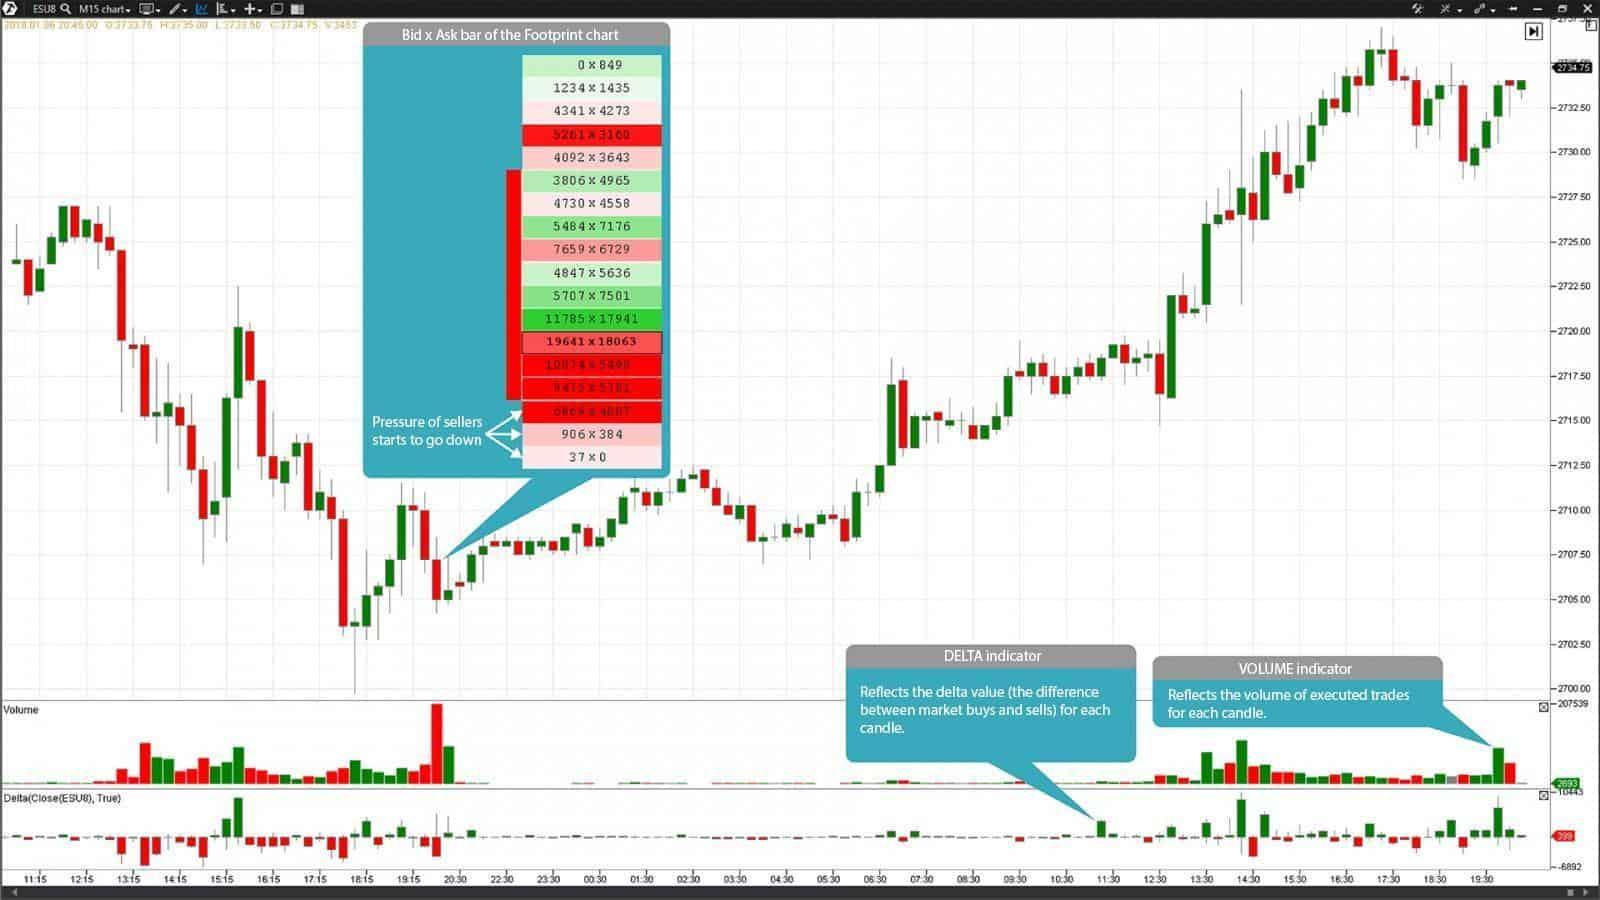 Bid x Ask bar of the Footprint chart